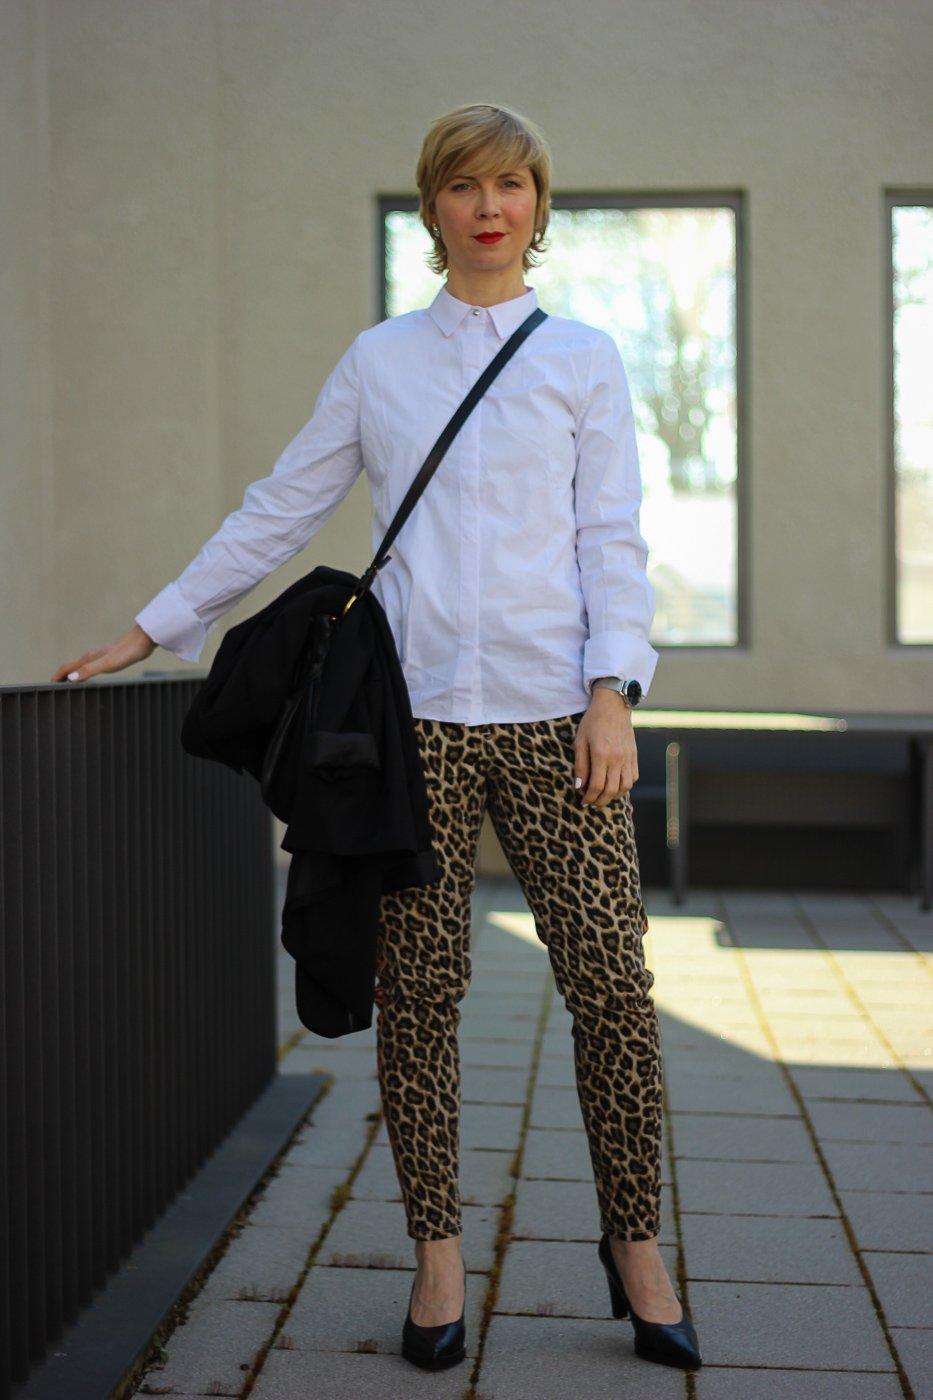 conny doll lifestyle: weiße Bluse, Leo-hose, Bürostyling, Officelook